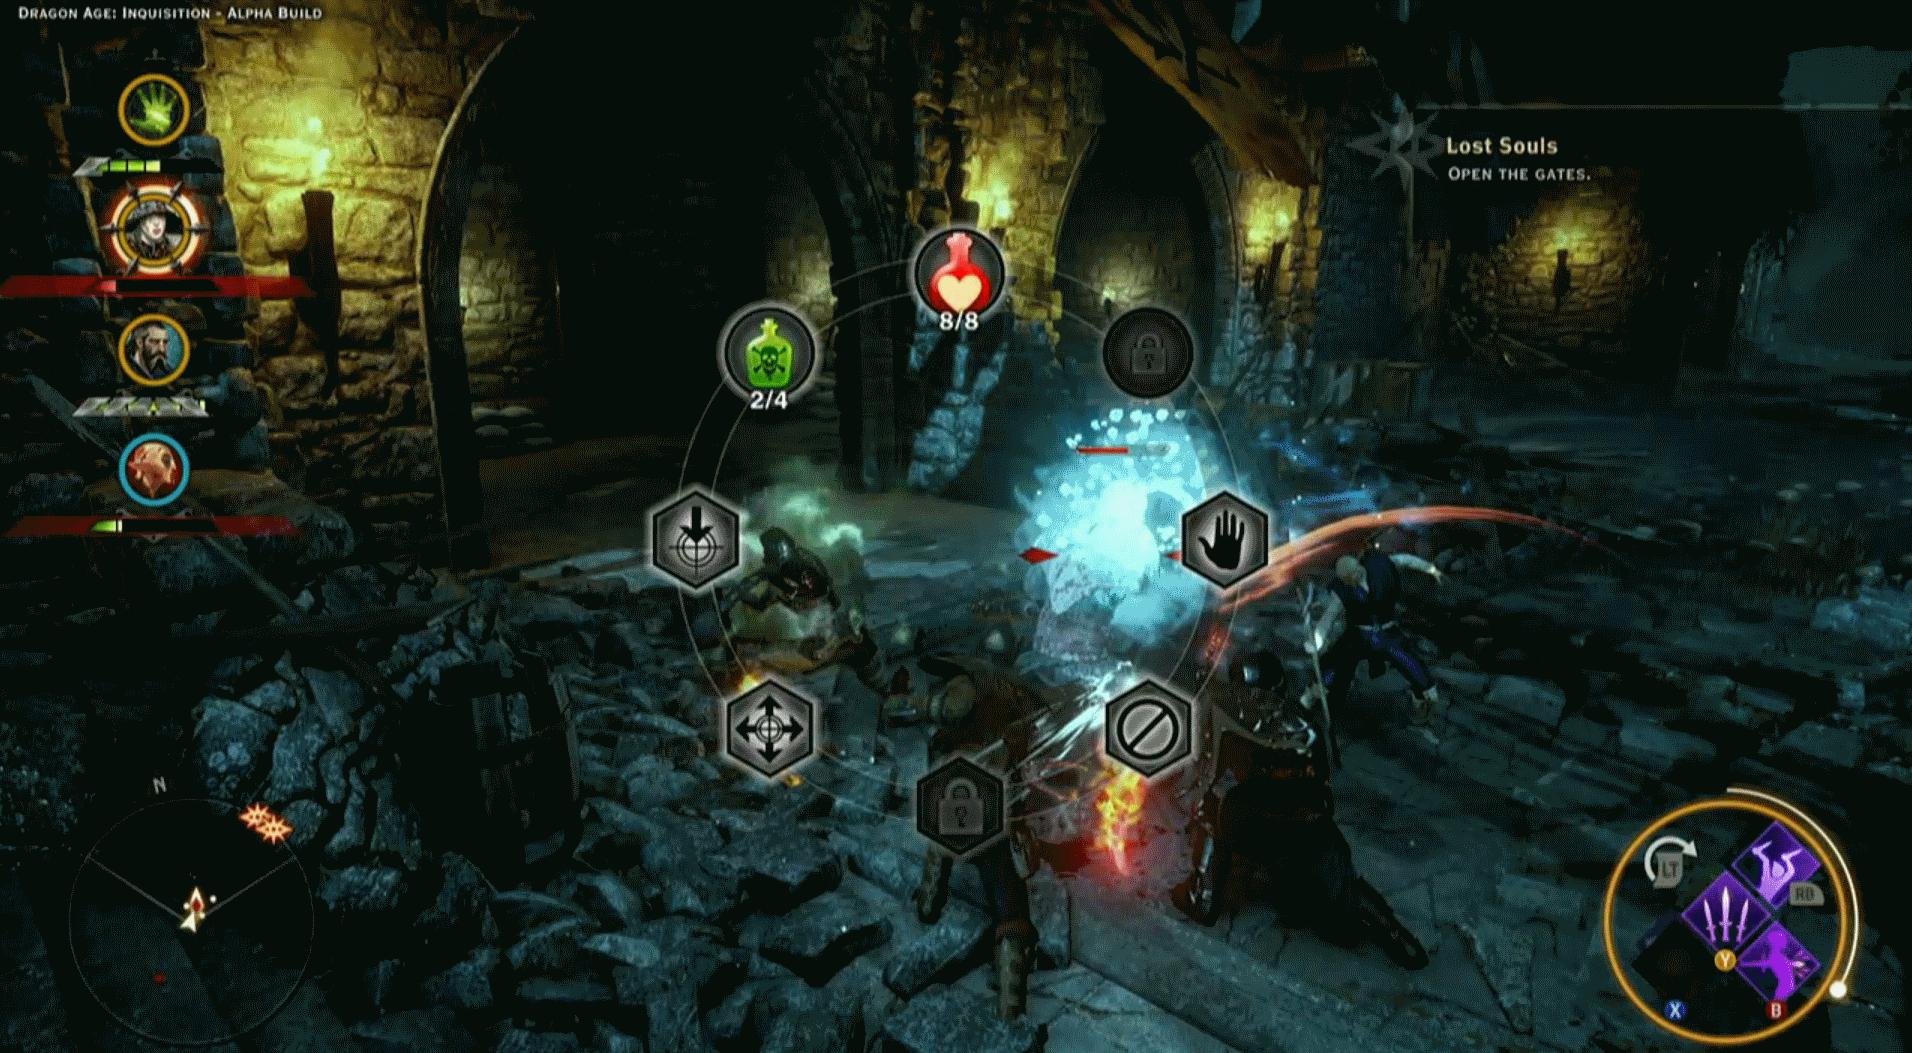 Dragon Age Inquisition: Gamescom demo shows world map ...